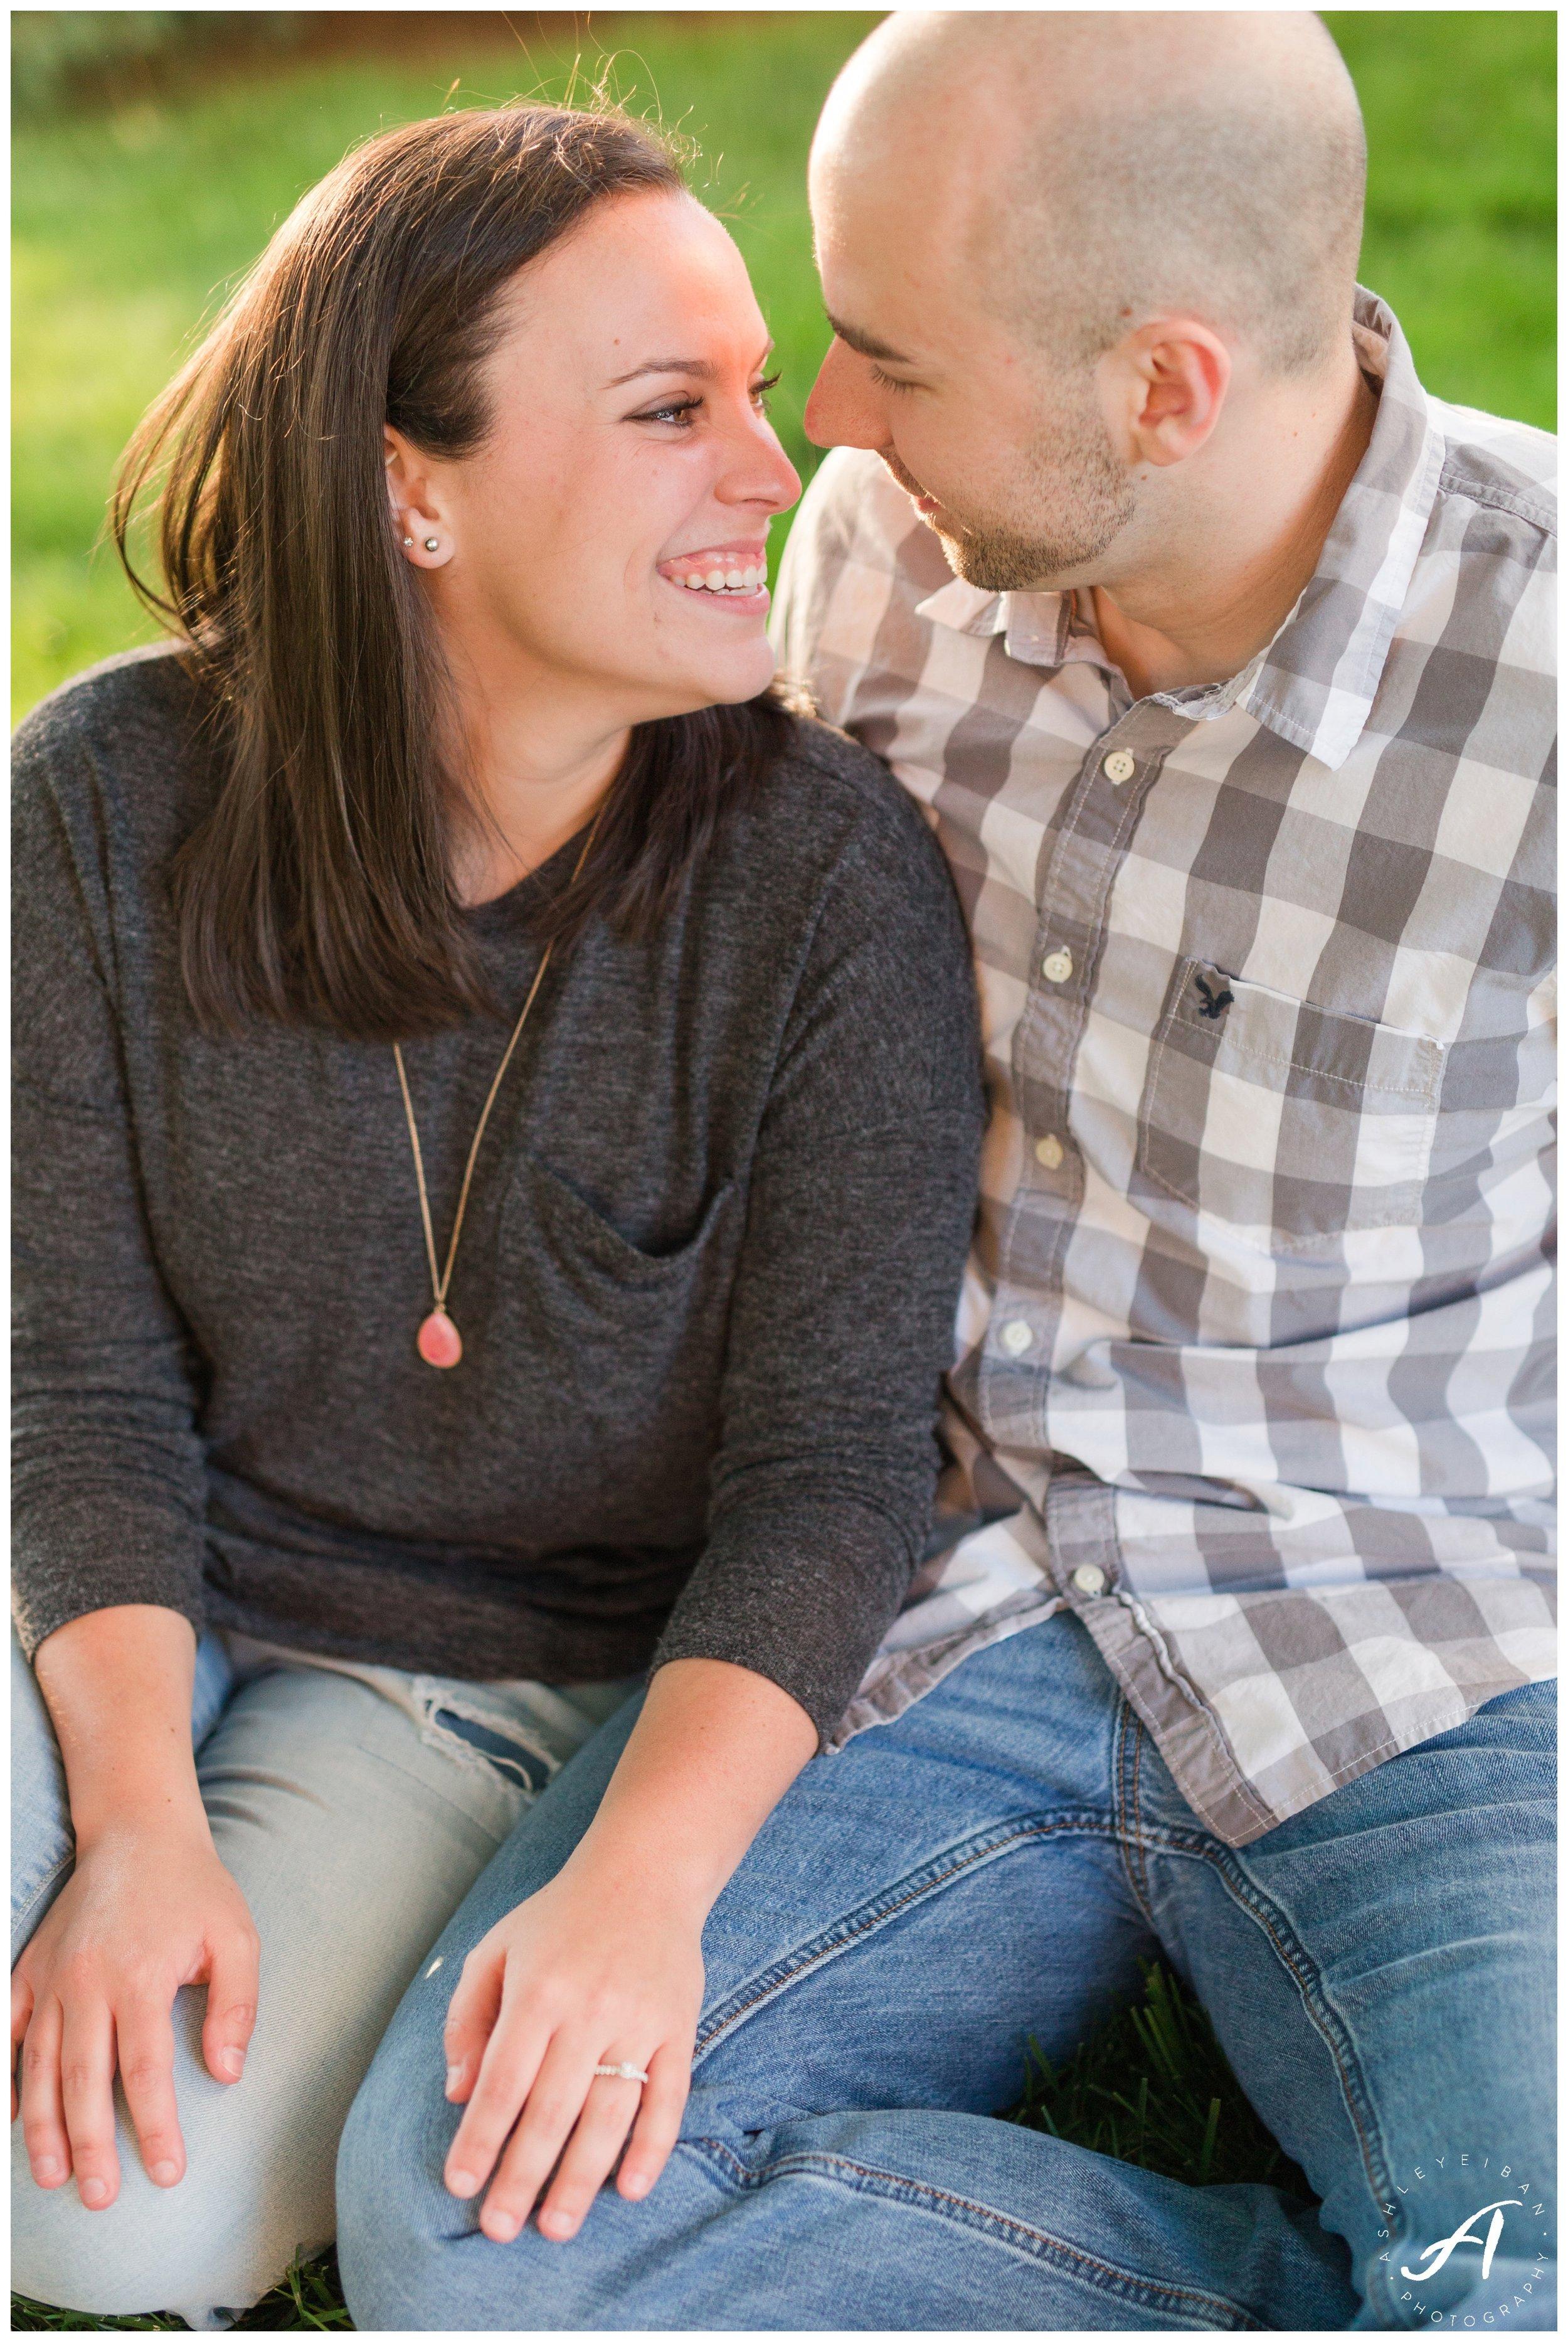 Roanoke and Lynchburg Virginia Wedding and Engagement Photographer || Ashley Eiban Photography || www.ashleyeiban.com